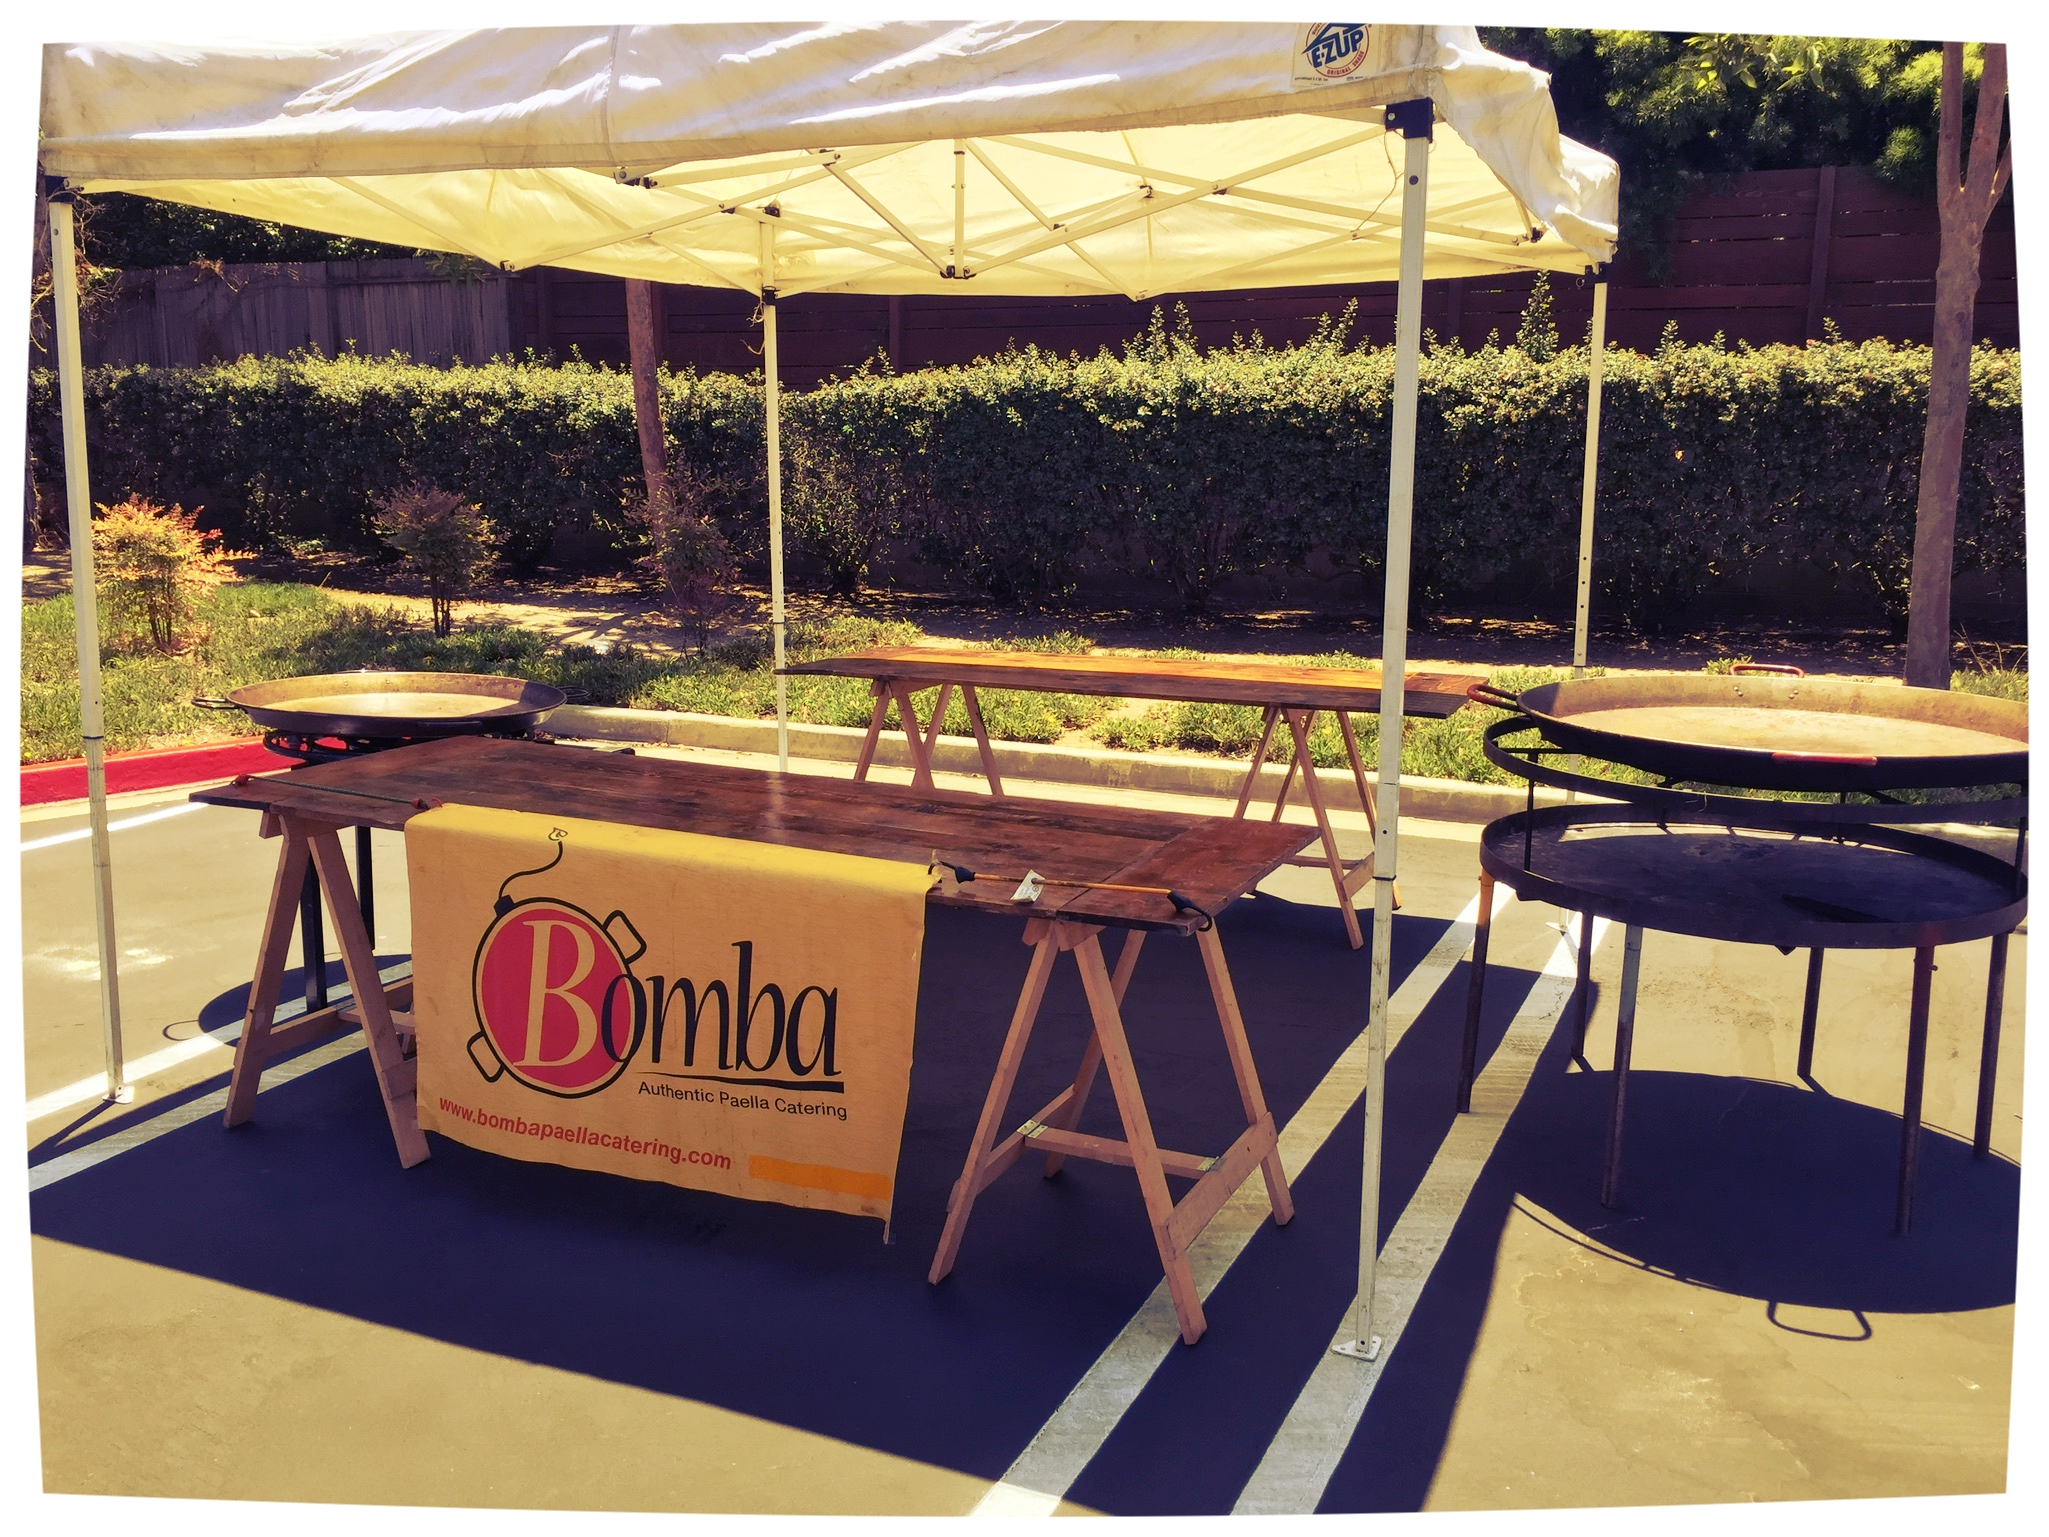 bomba-paella-catering -layout-8.jpg